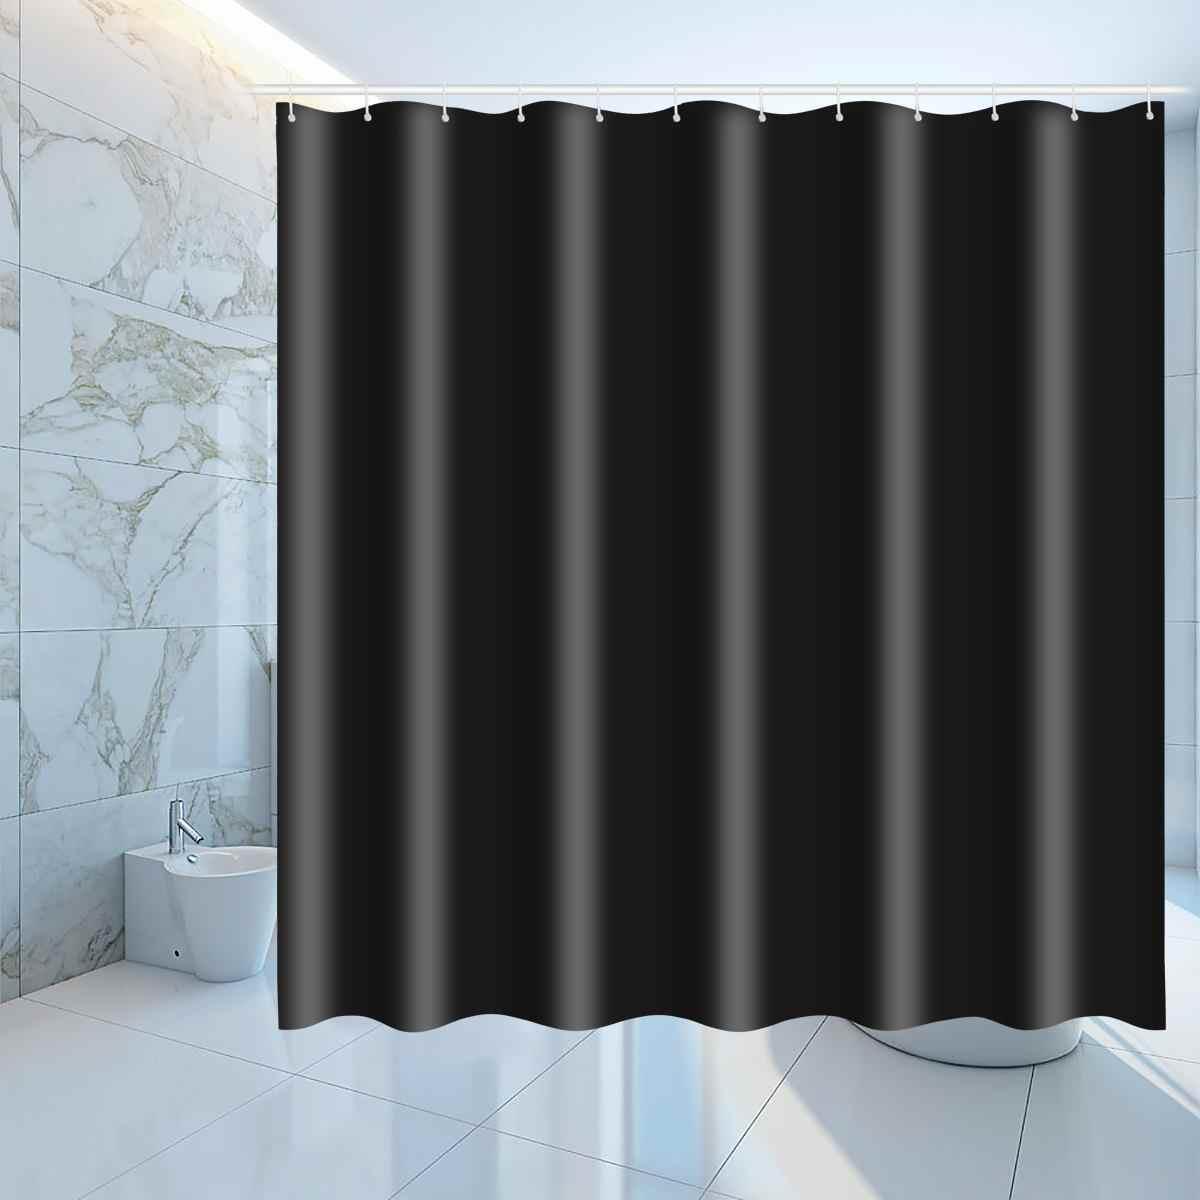 New 3 Sizes Waterproof Polyester Shower Curtains Hooks Set Black Bathroom Window Curtain Bath Curtains Drape Hotel Home Decorati Aliexpress